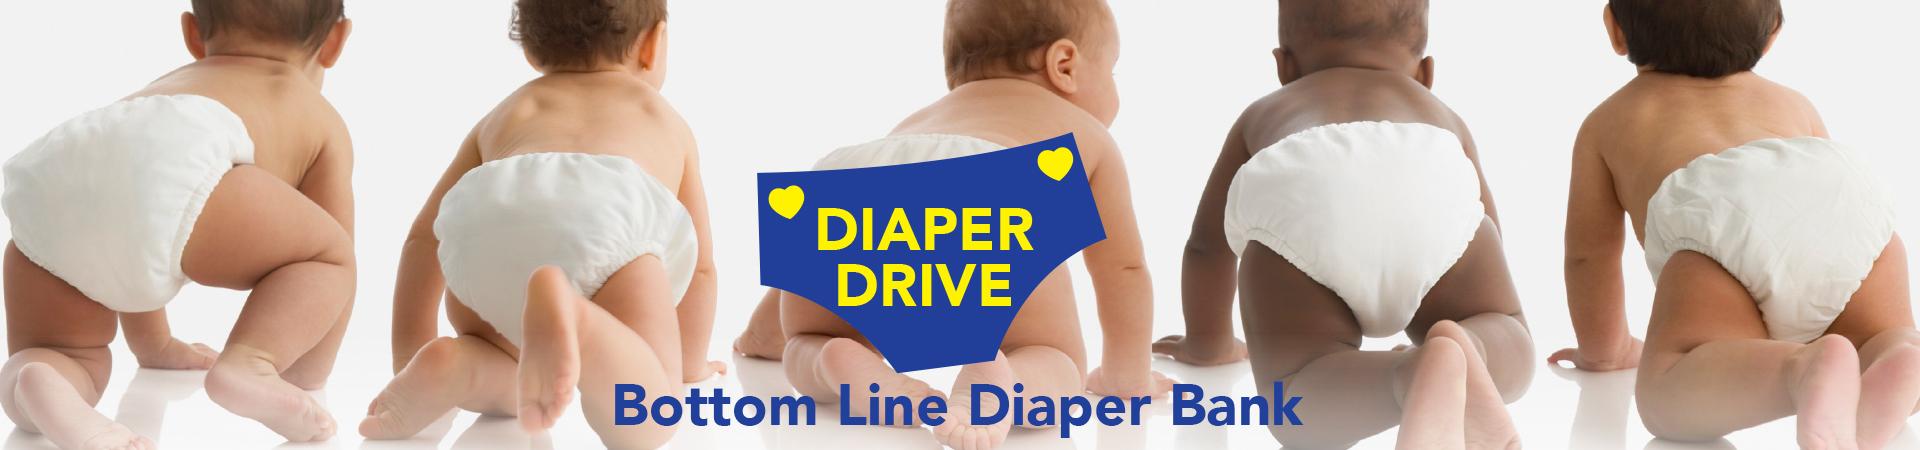 Bottom Line Diaper Bank 2021 web header